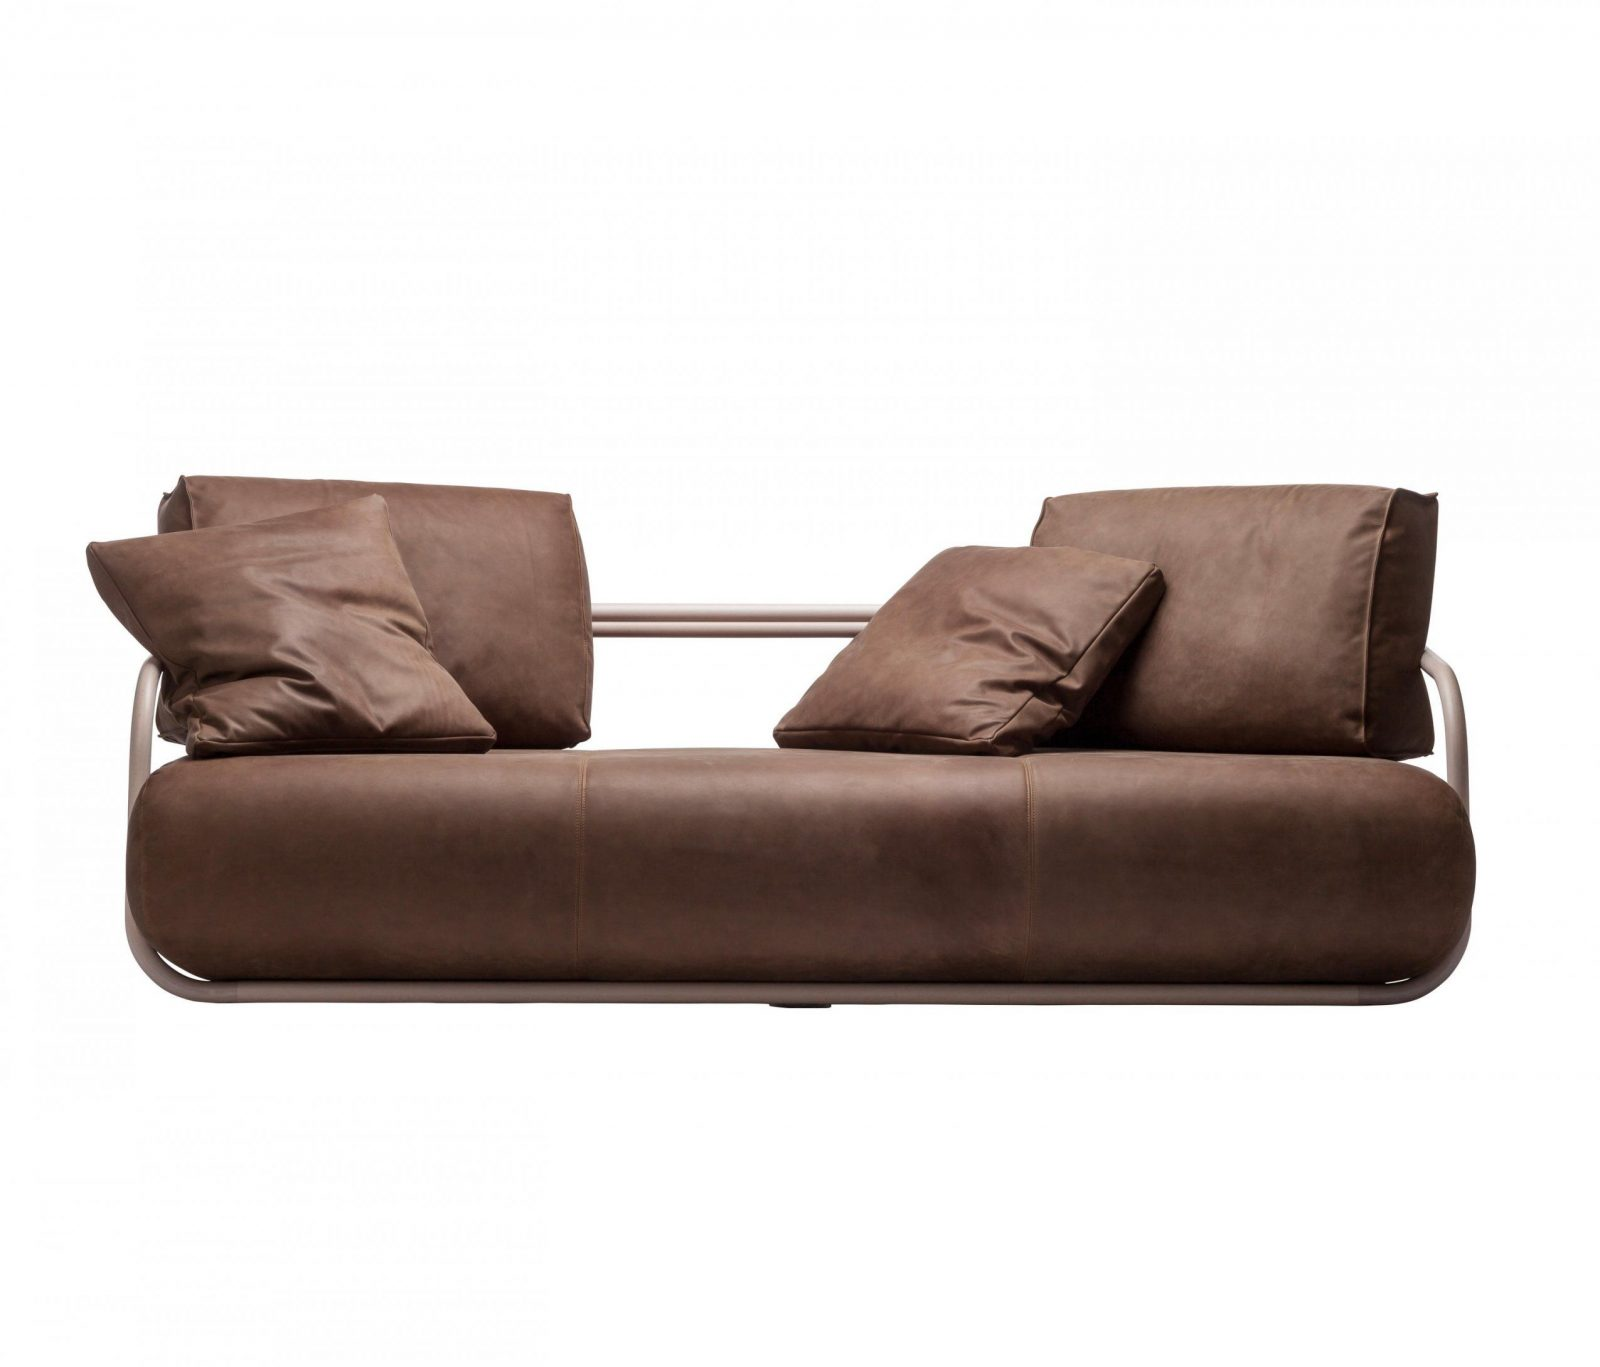 Seats Sofas Elegant Sofa Design Gray Worcester And Bremen